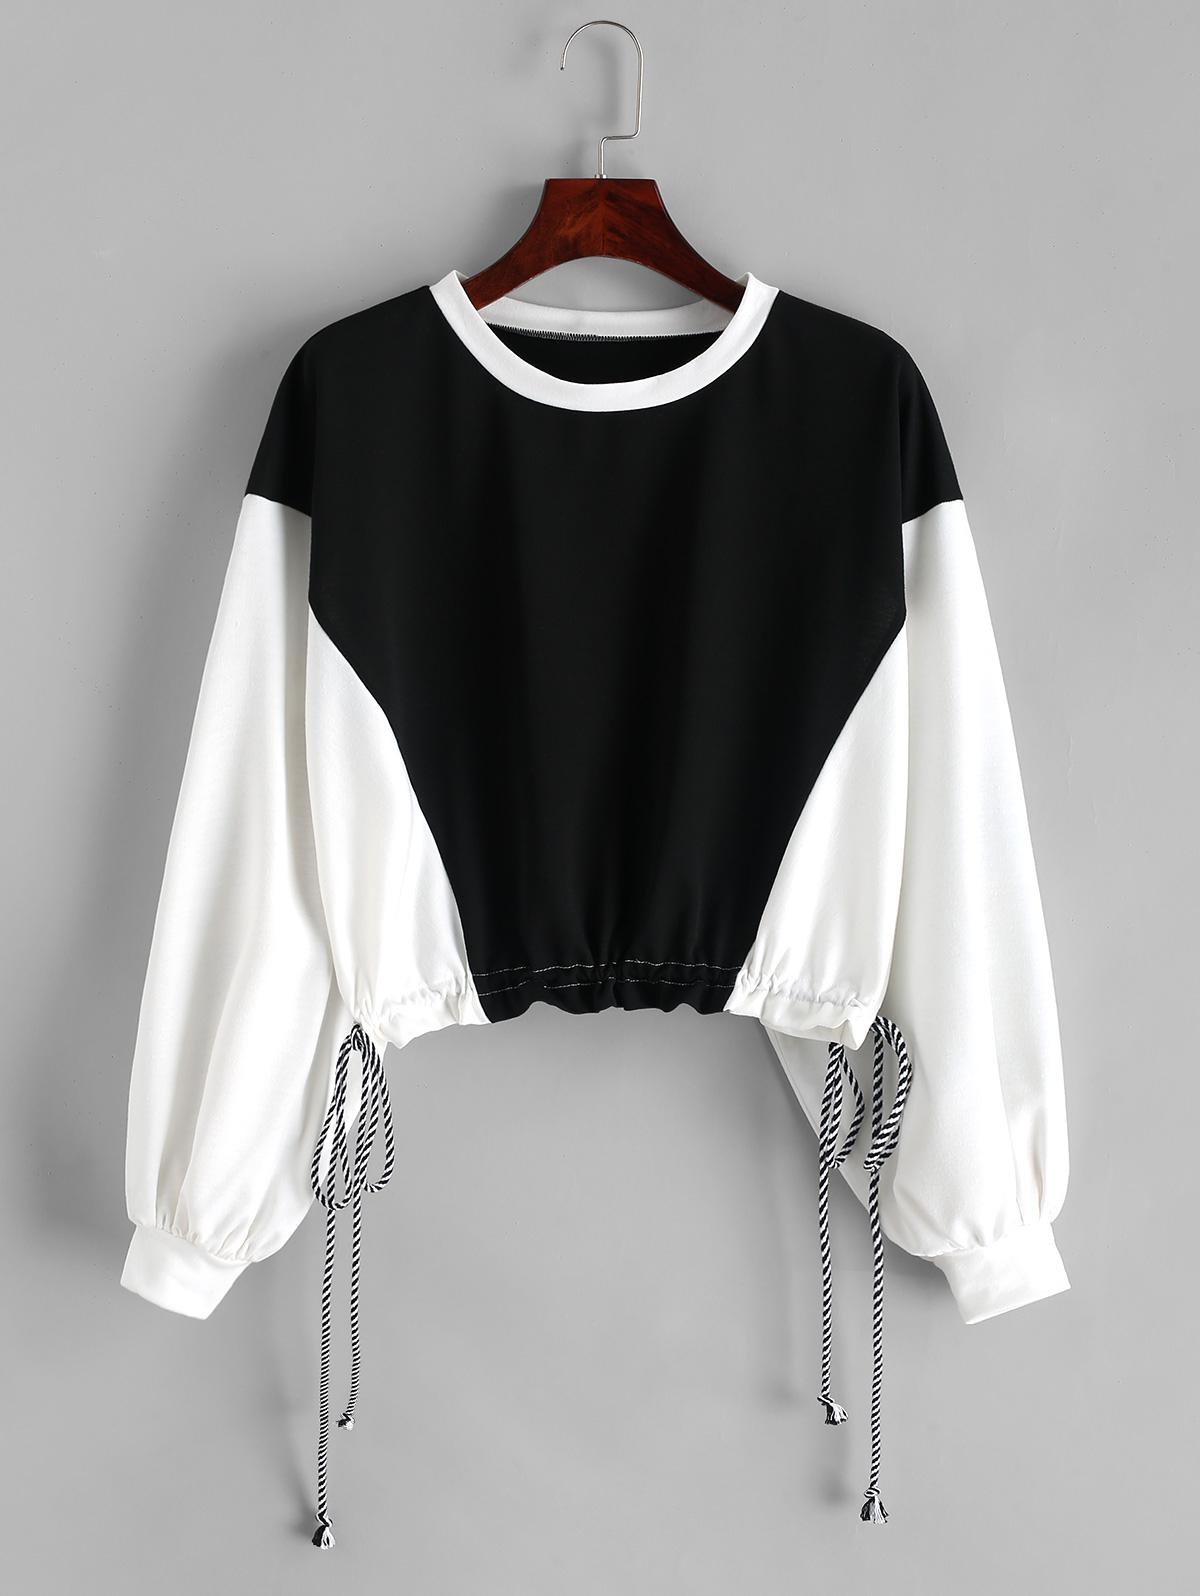 ZAFUL Two Tone Drop Shoulder Drawstring Cropped Sweatshirt, Multi